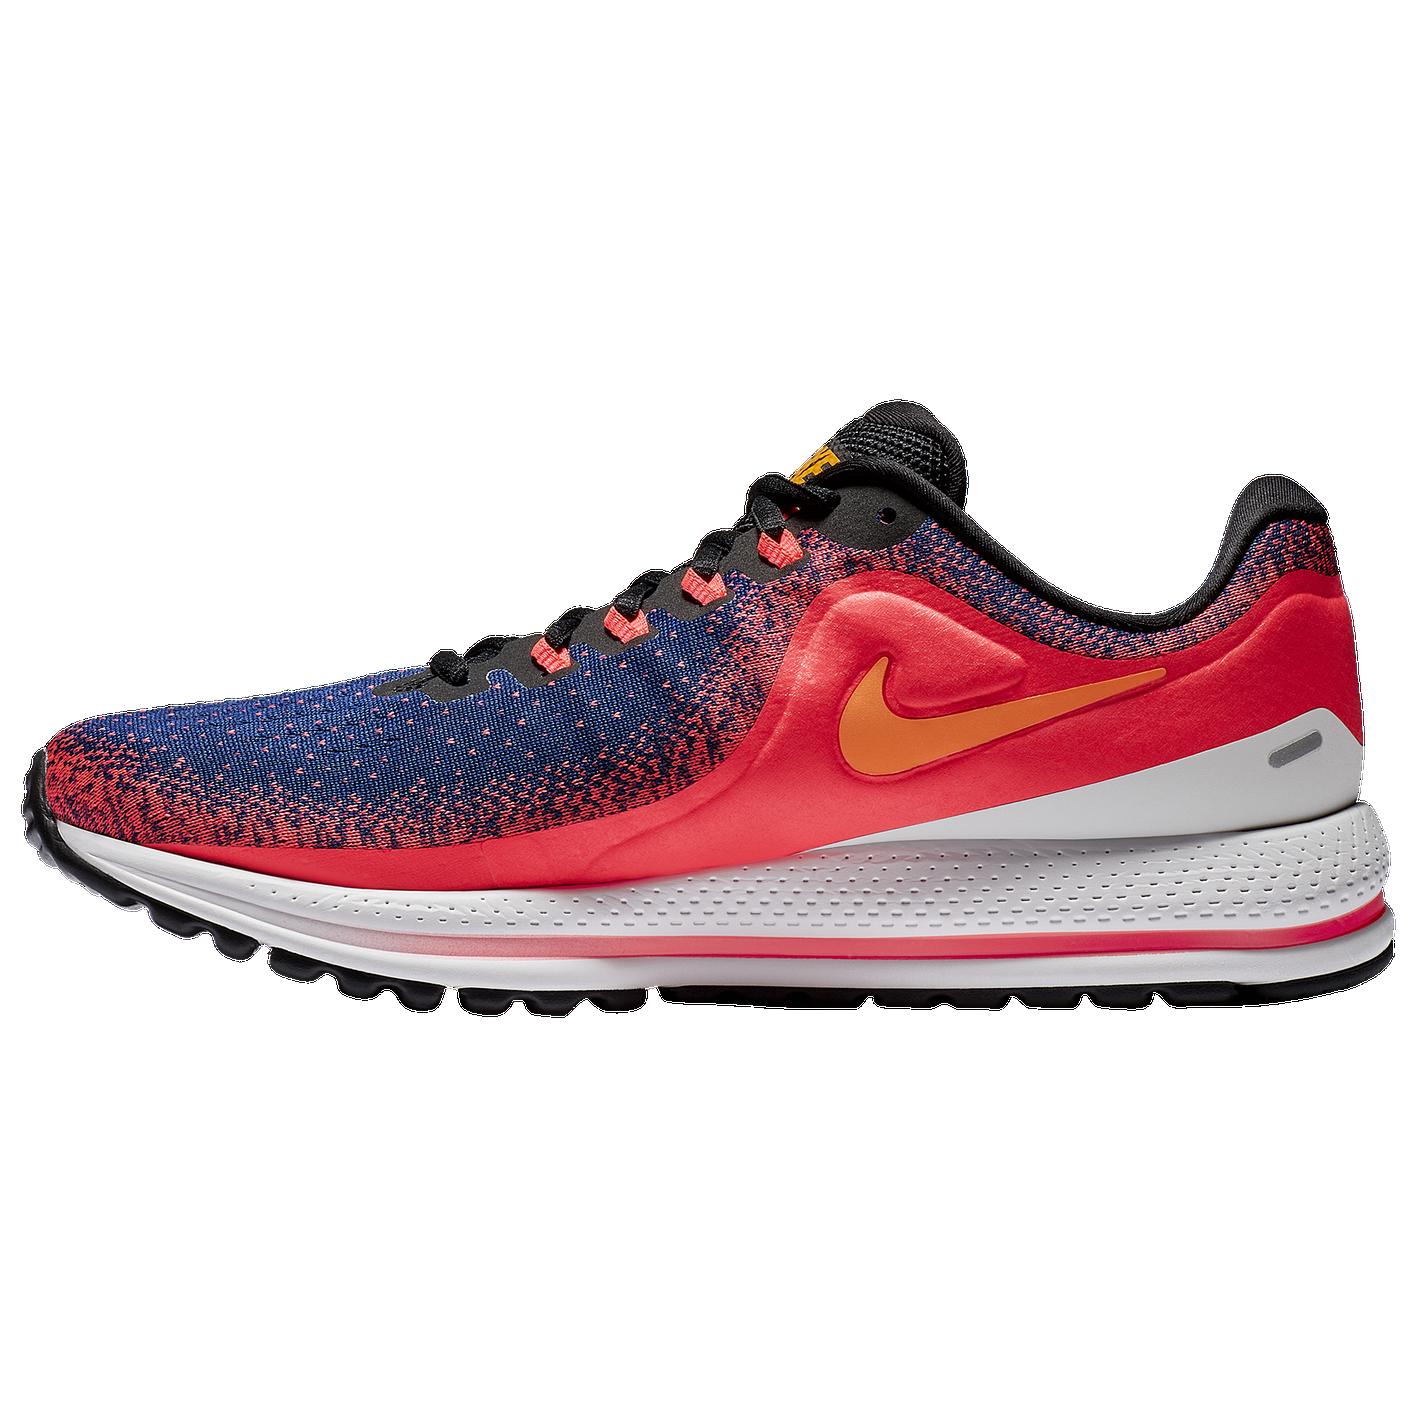 205cb0138b784 Nike Air Zoom Vomero 13 - Men s - Running - Shoes - Blue Void Orange ...